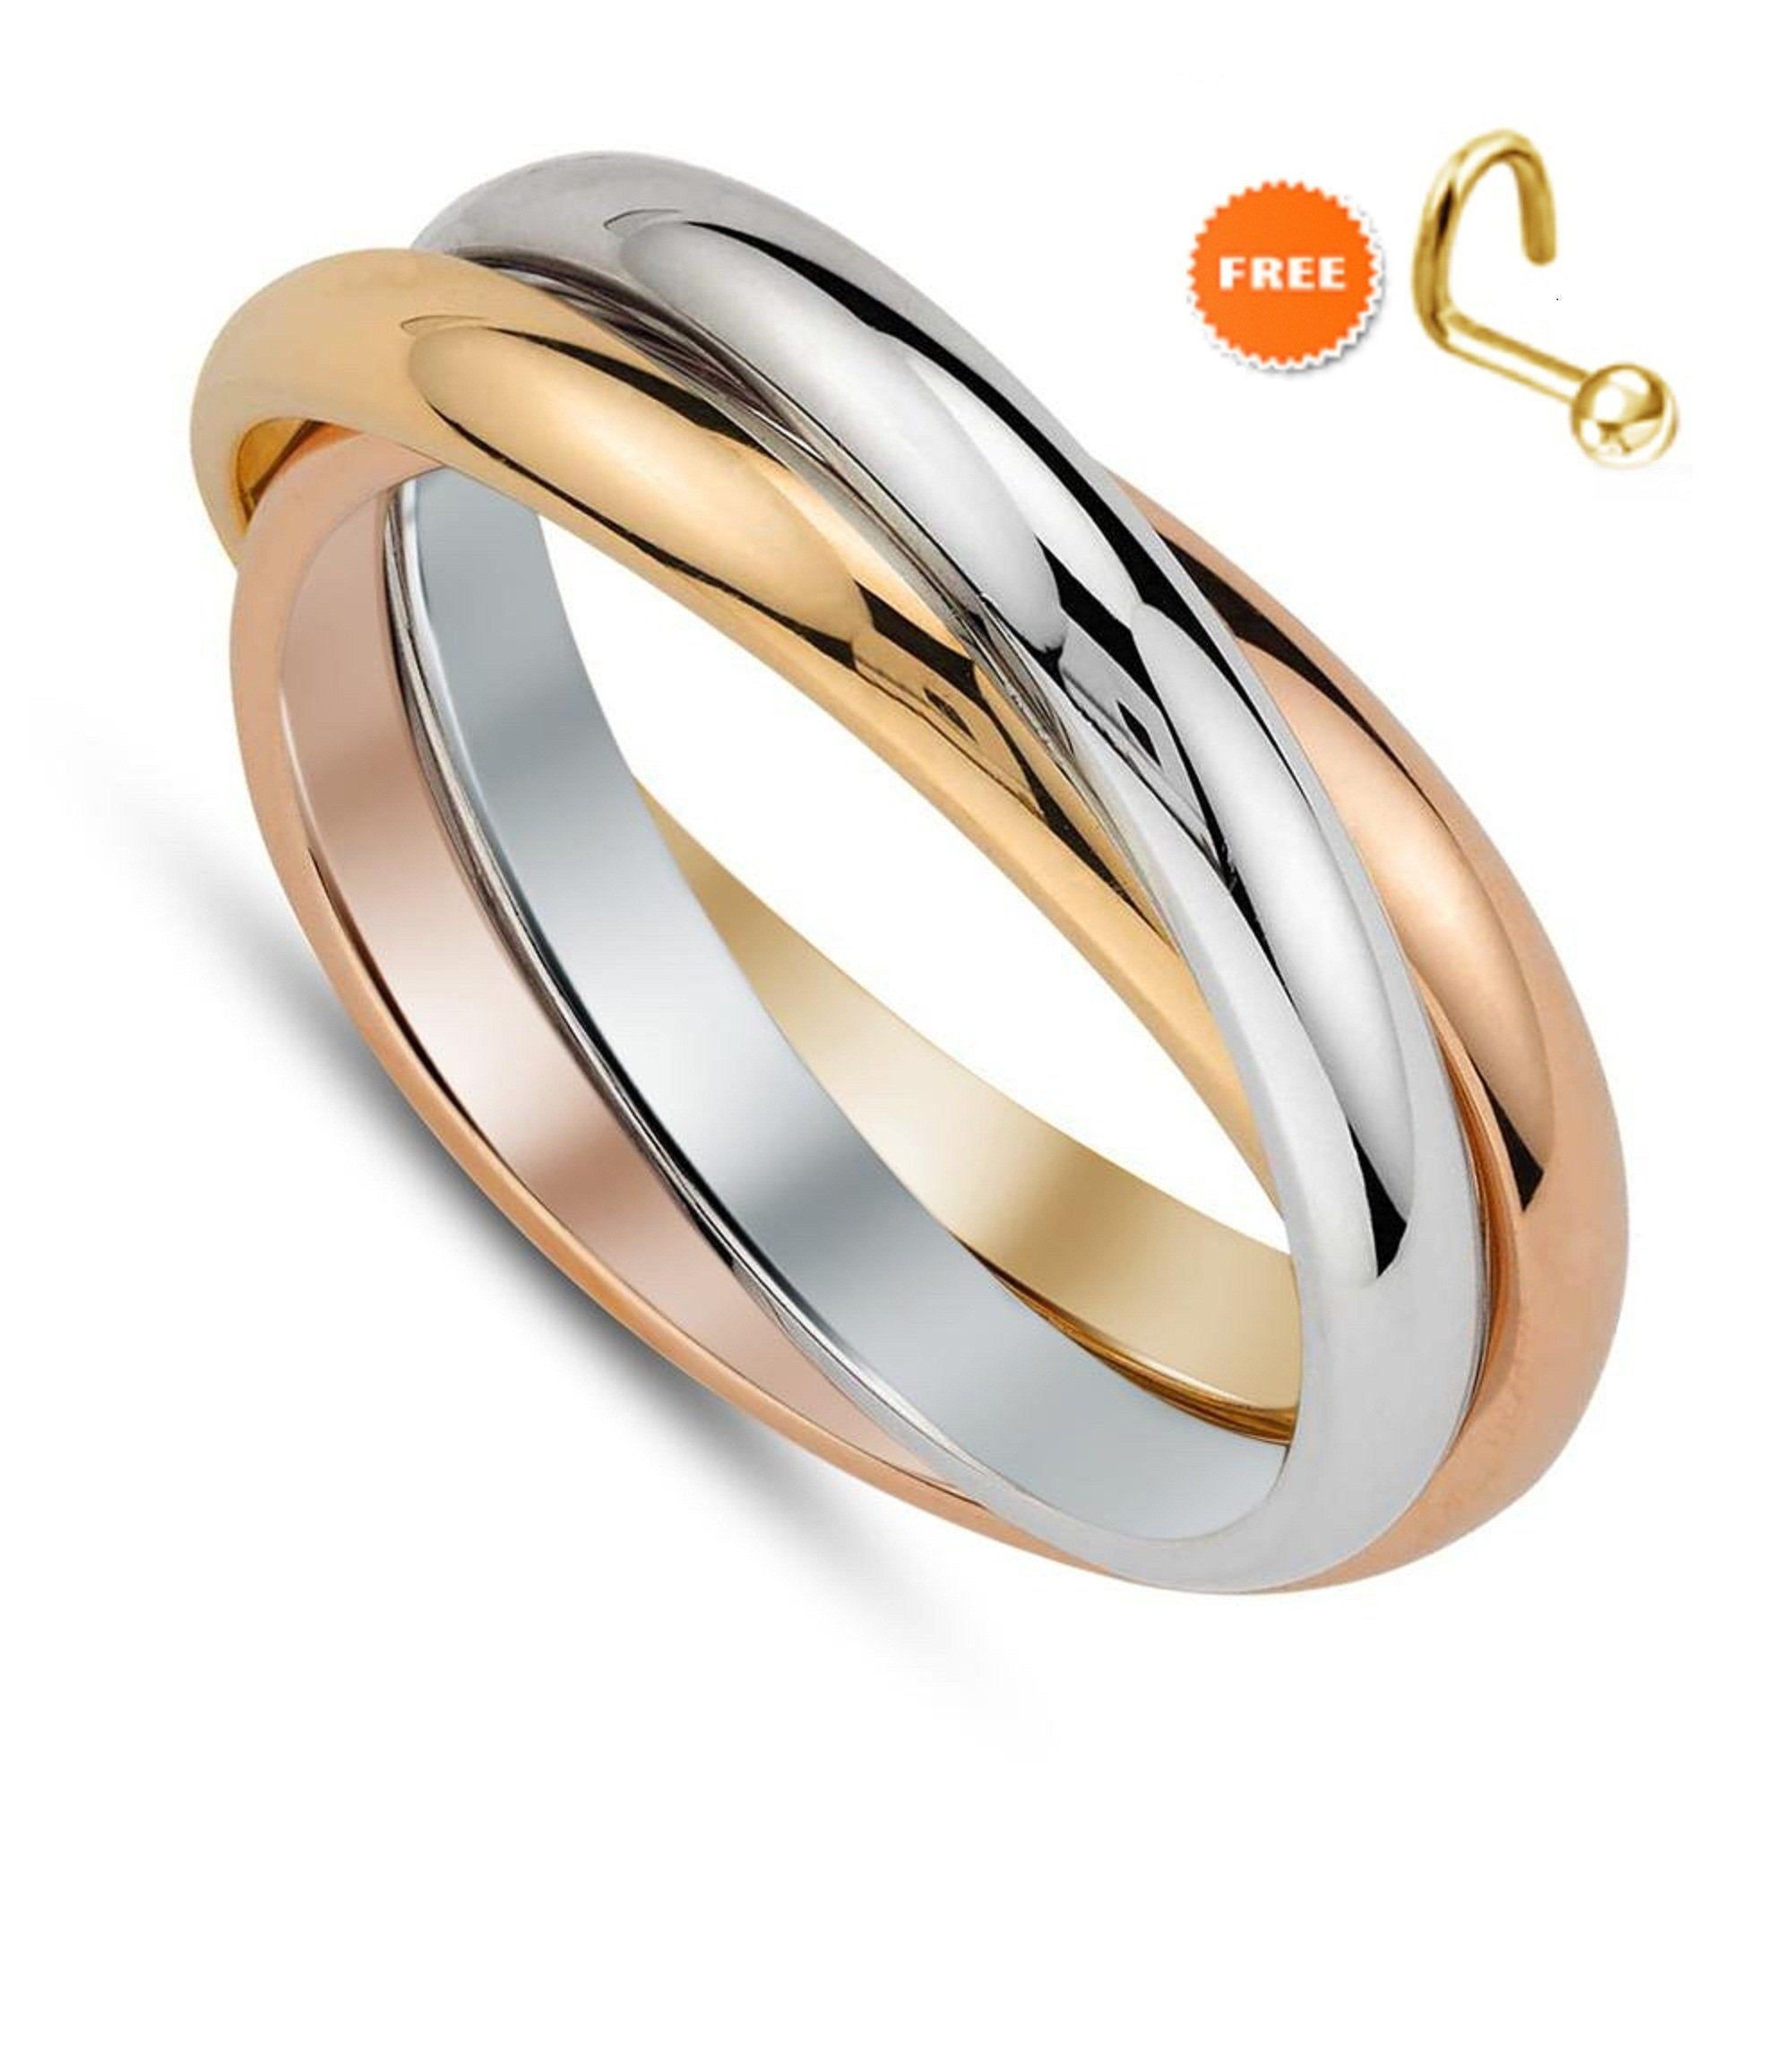 Three Tone Ring 14k 18k Gold Plated Women S Band Ladies Fancy Ring Wedding Ring Band 3 Color Ring Stackable Ring Free Gift Three Tone Ring Beautiful Diamond Rings Men Diamond Ring